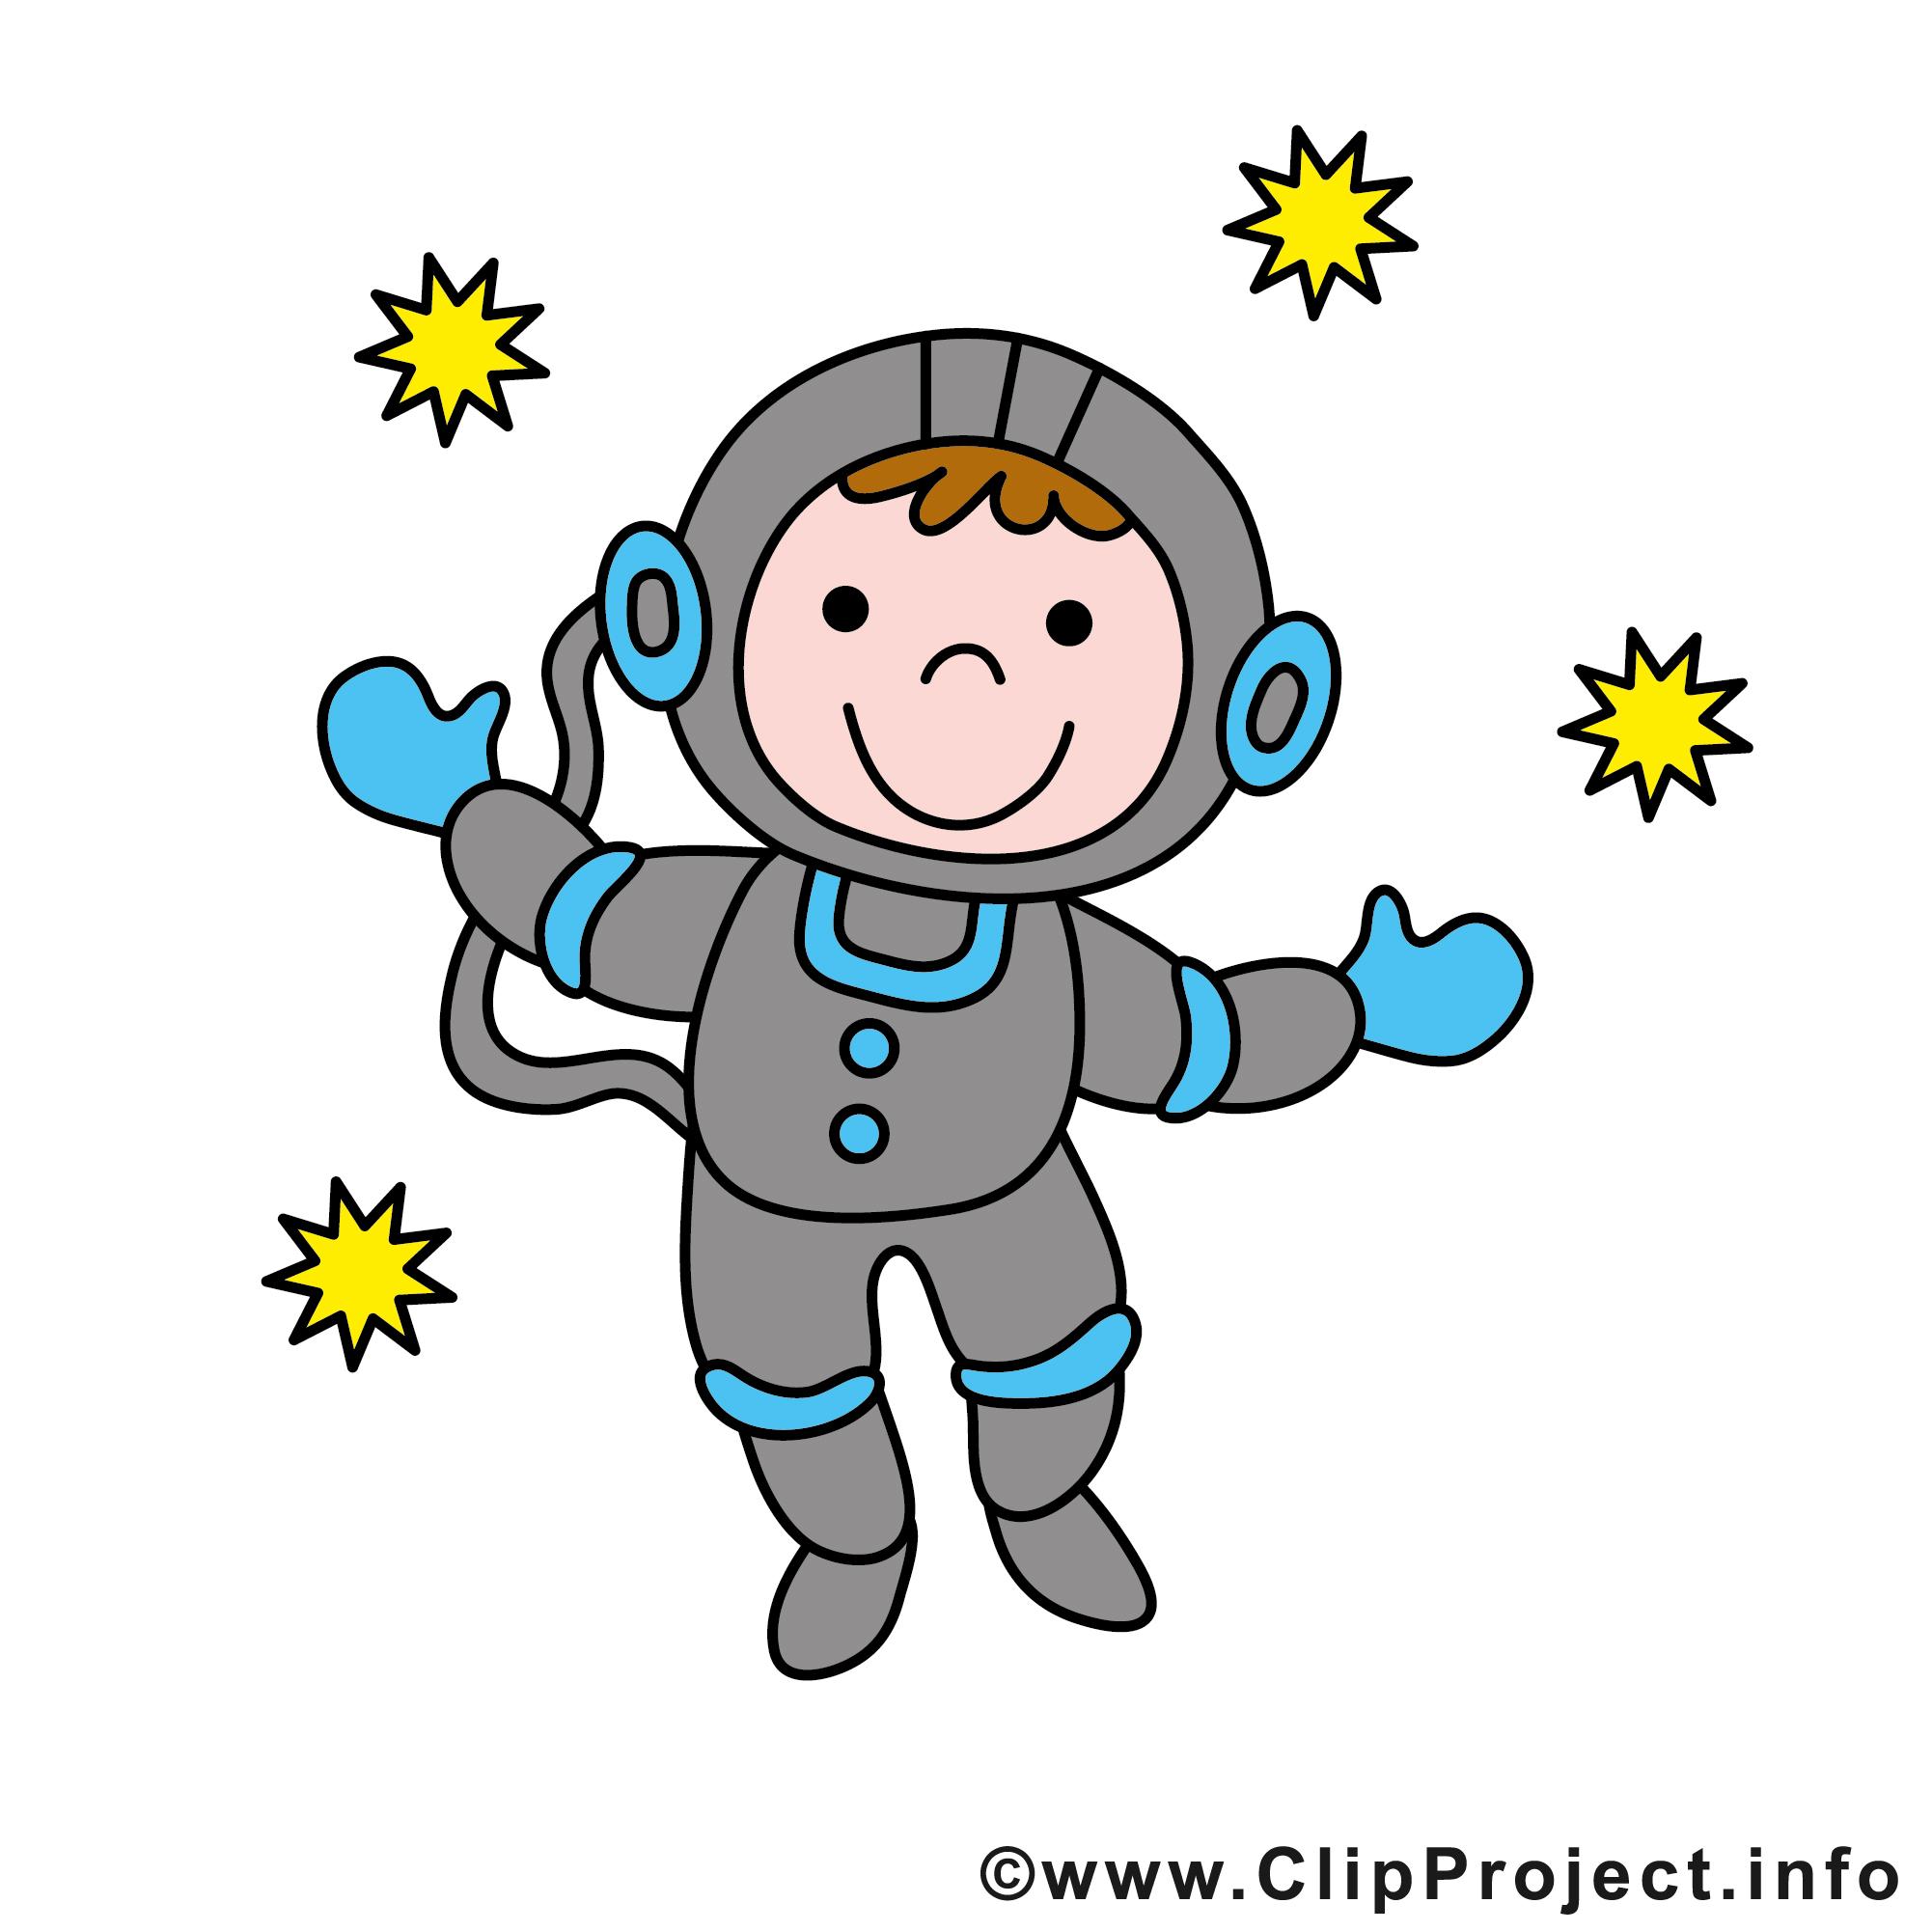 Astronaut 20clip 20art Clipart Panda Fre-Astronaut 20clip 20art Clipart Panda Free Clipart Images-2